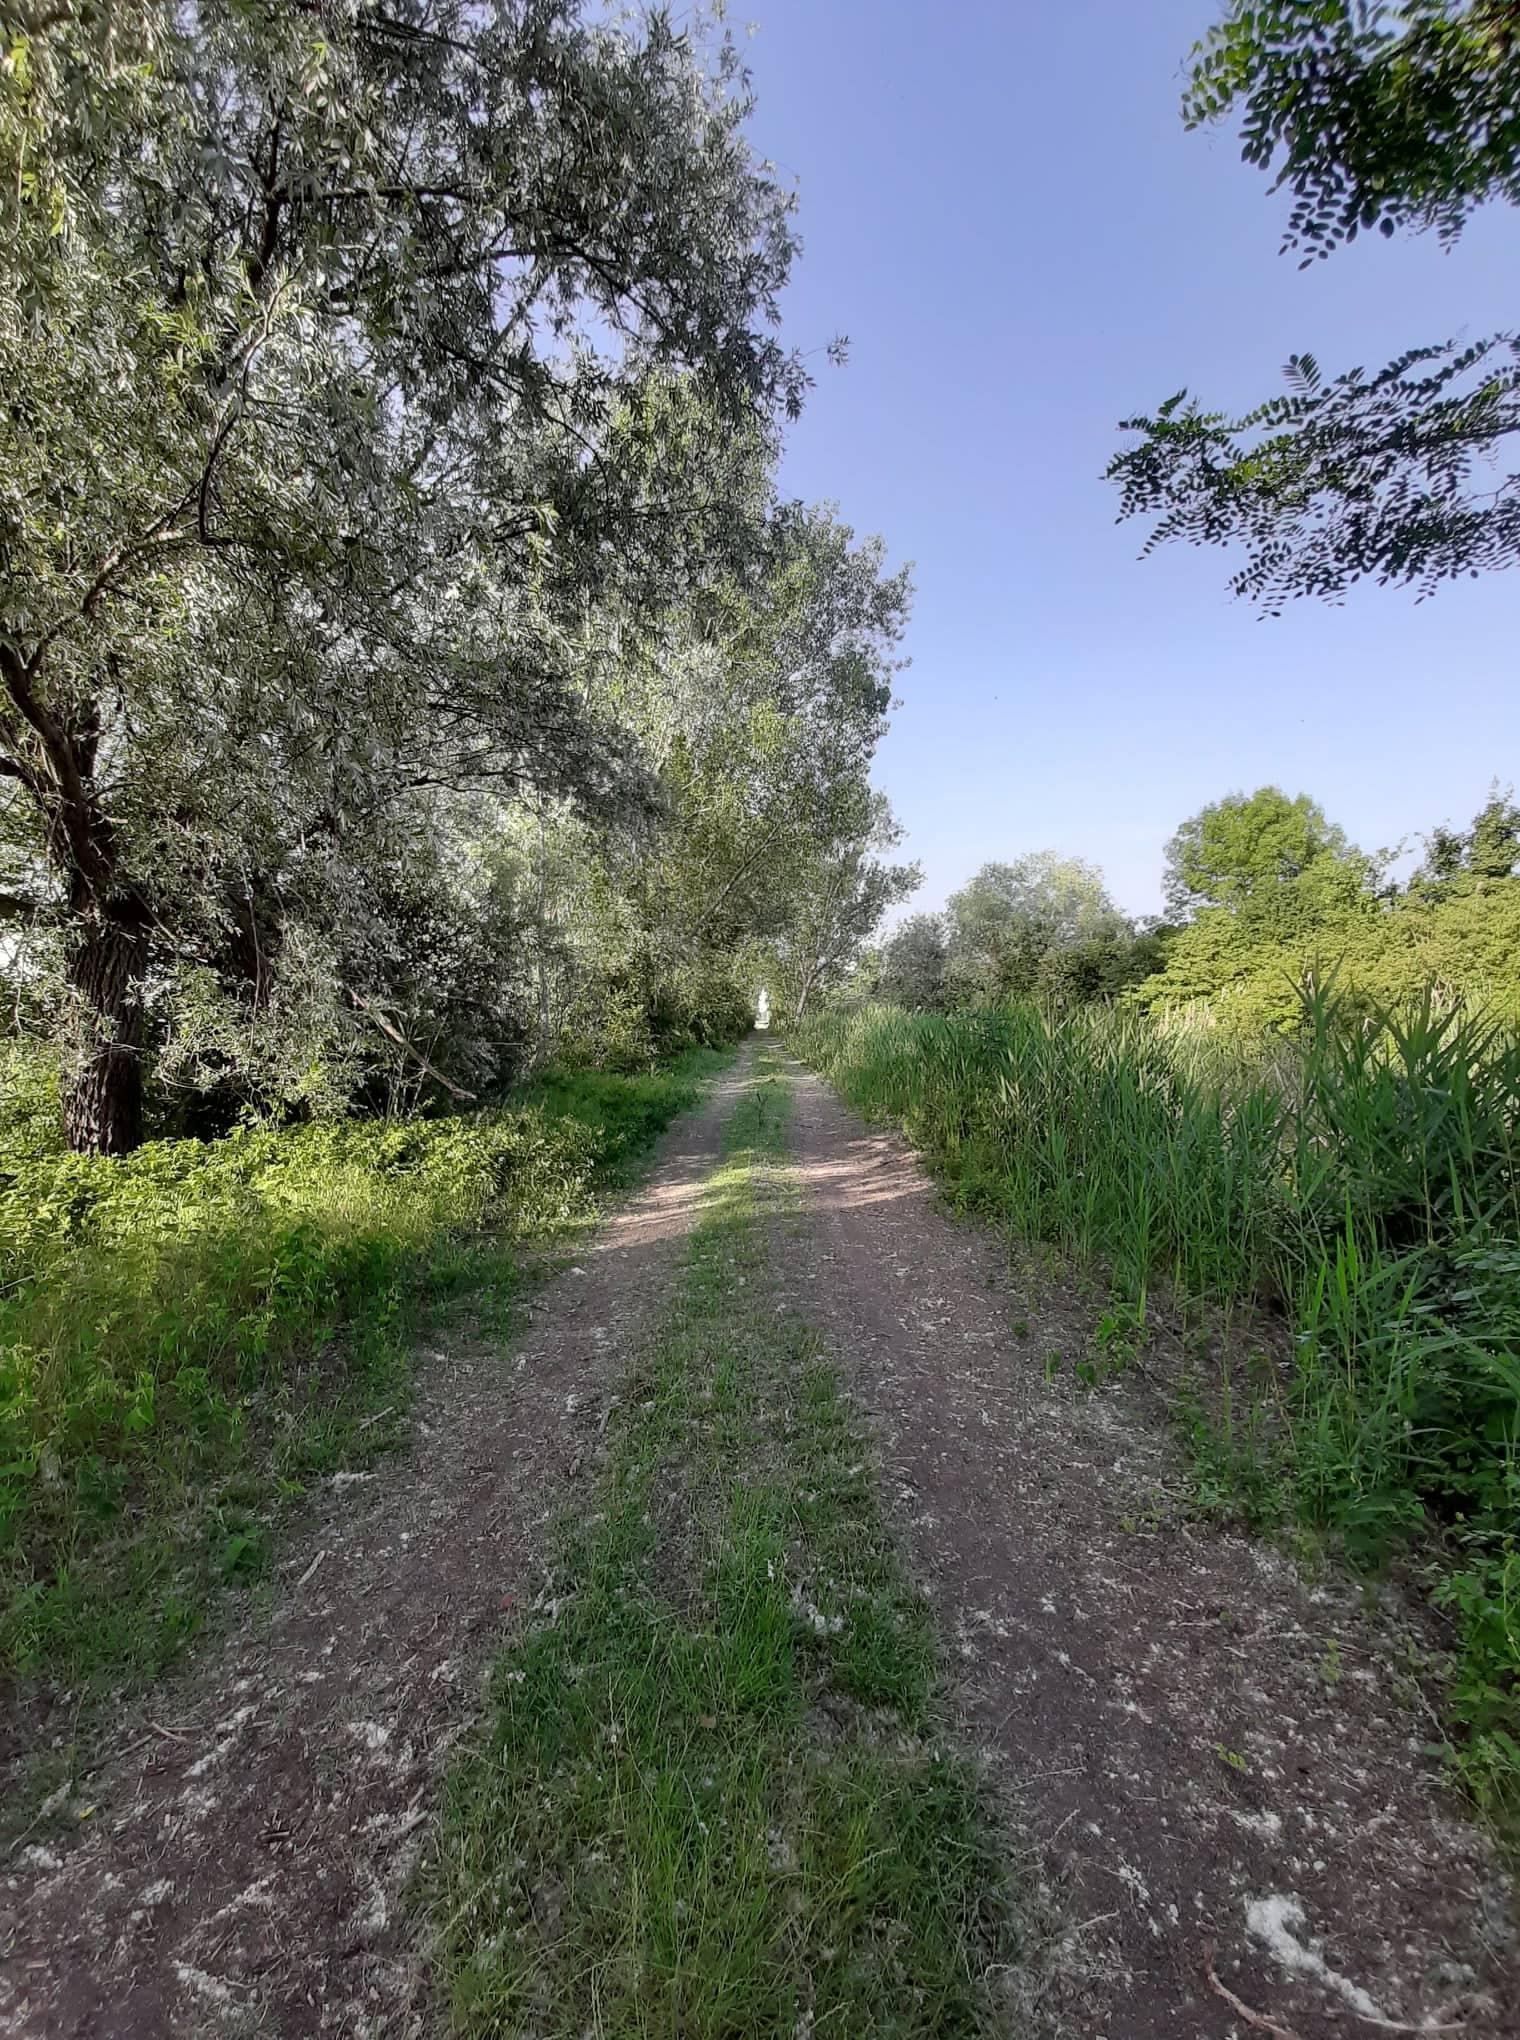 sentiero-cai-reggiolo